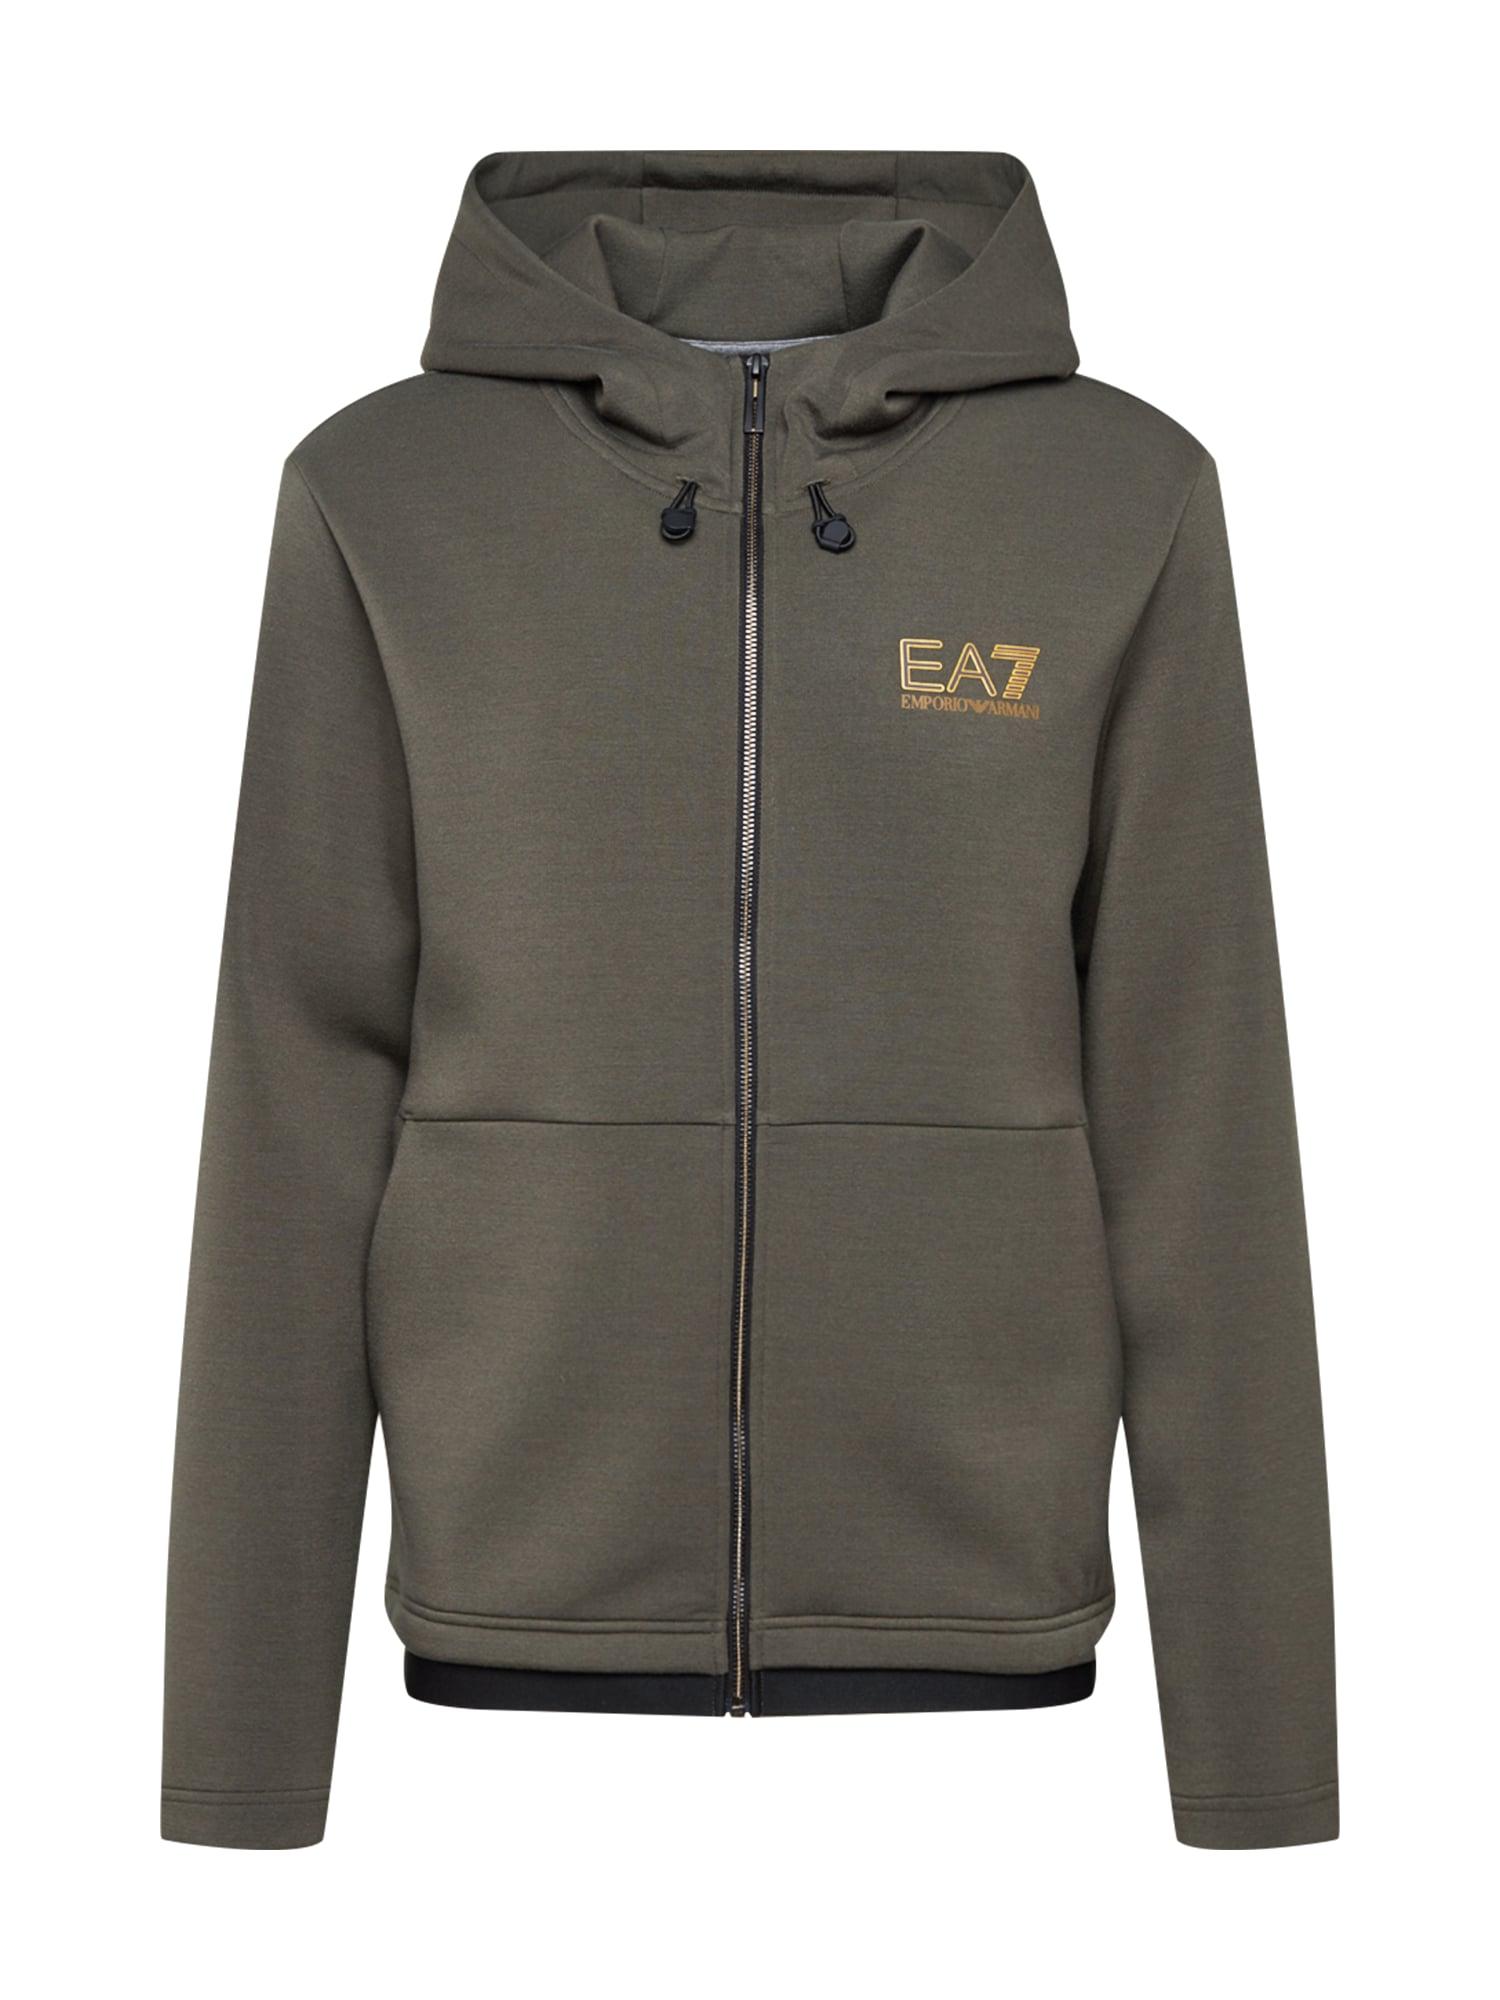 EA7 Emporio Armani Džemperis tamsiai žalia / aukso geltonumo spalva / juoda